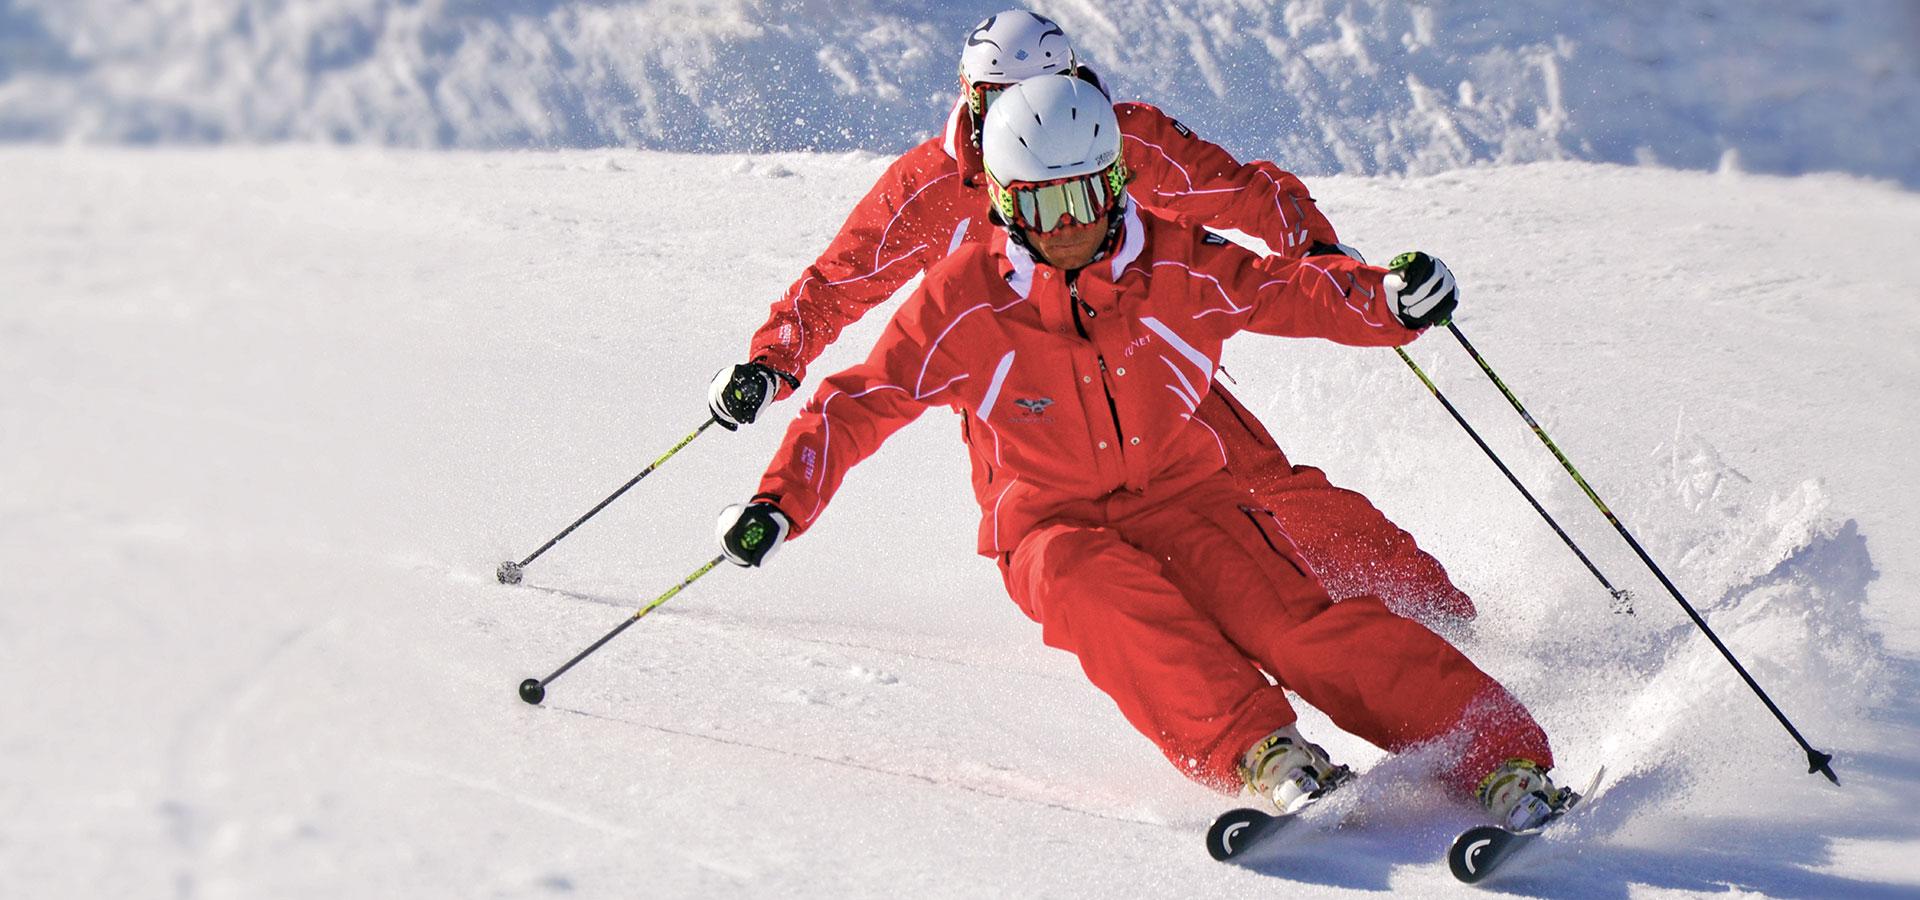 Ski Snowboard Snow Sports Instructor Training Lizum 1600